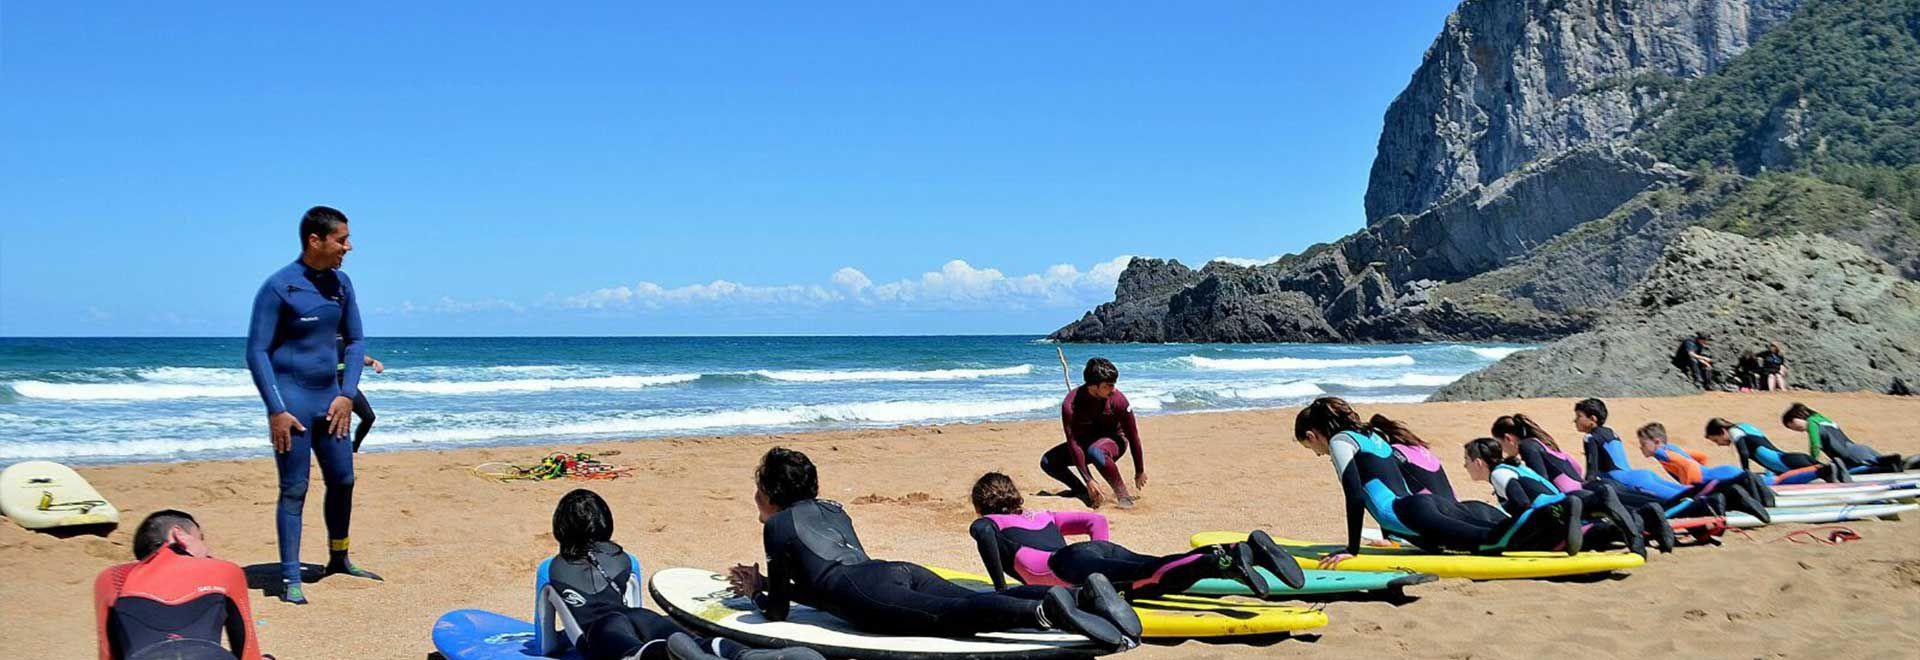 Surfeja l'Atlàntic per Setmana Santa. Surf Camp País Basc.